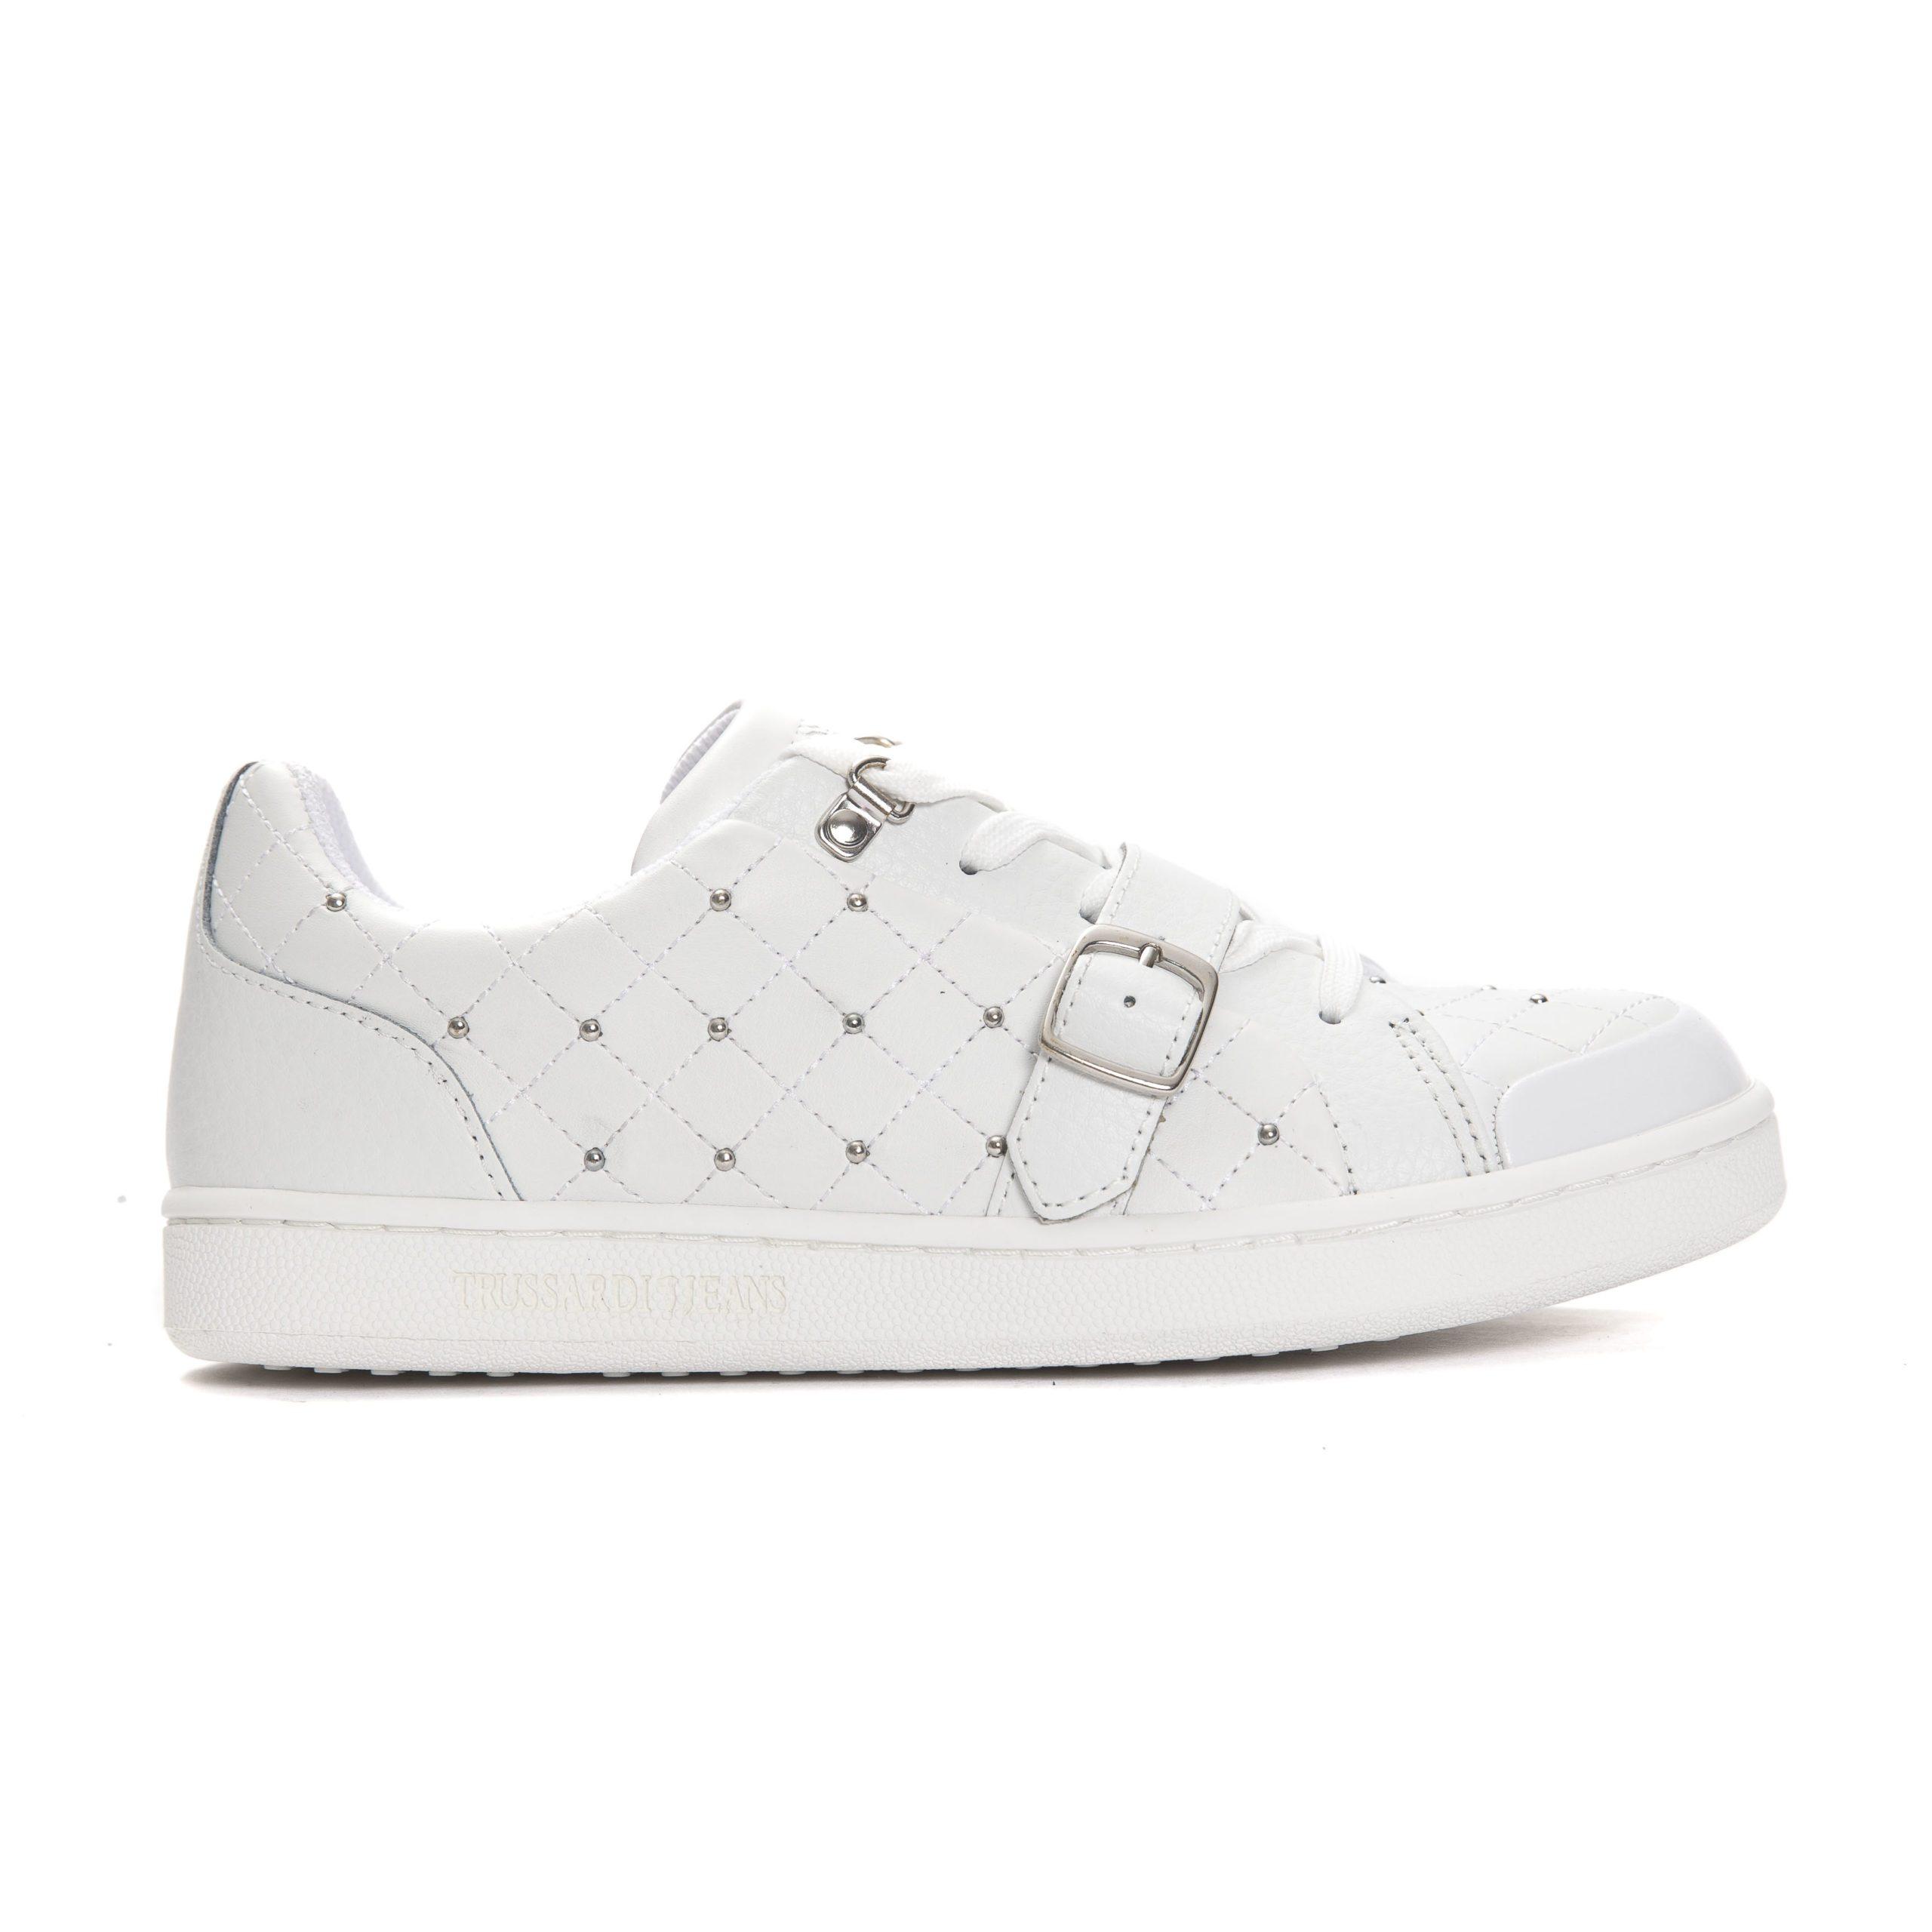 Trussardi Jeans Women's Trainers White TR662891 - EU37/US6.5